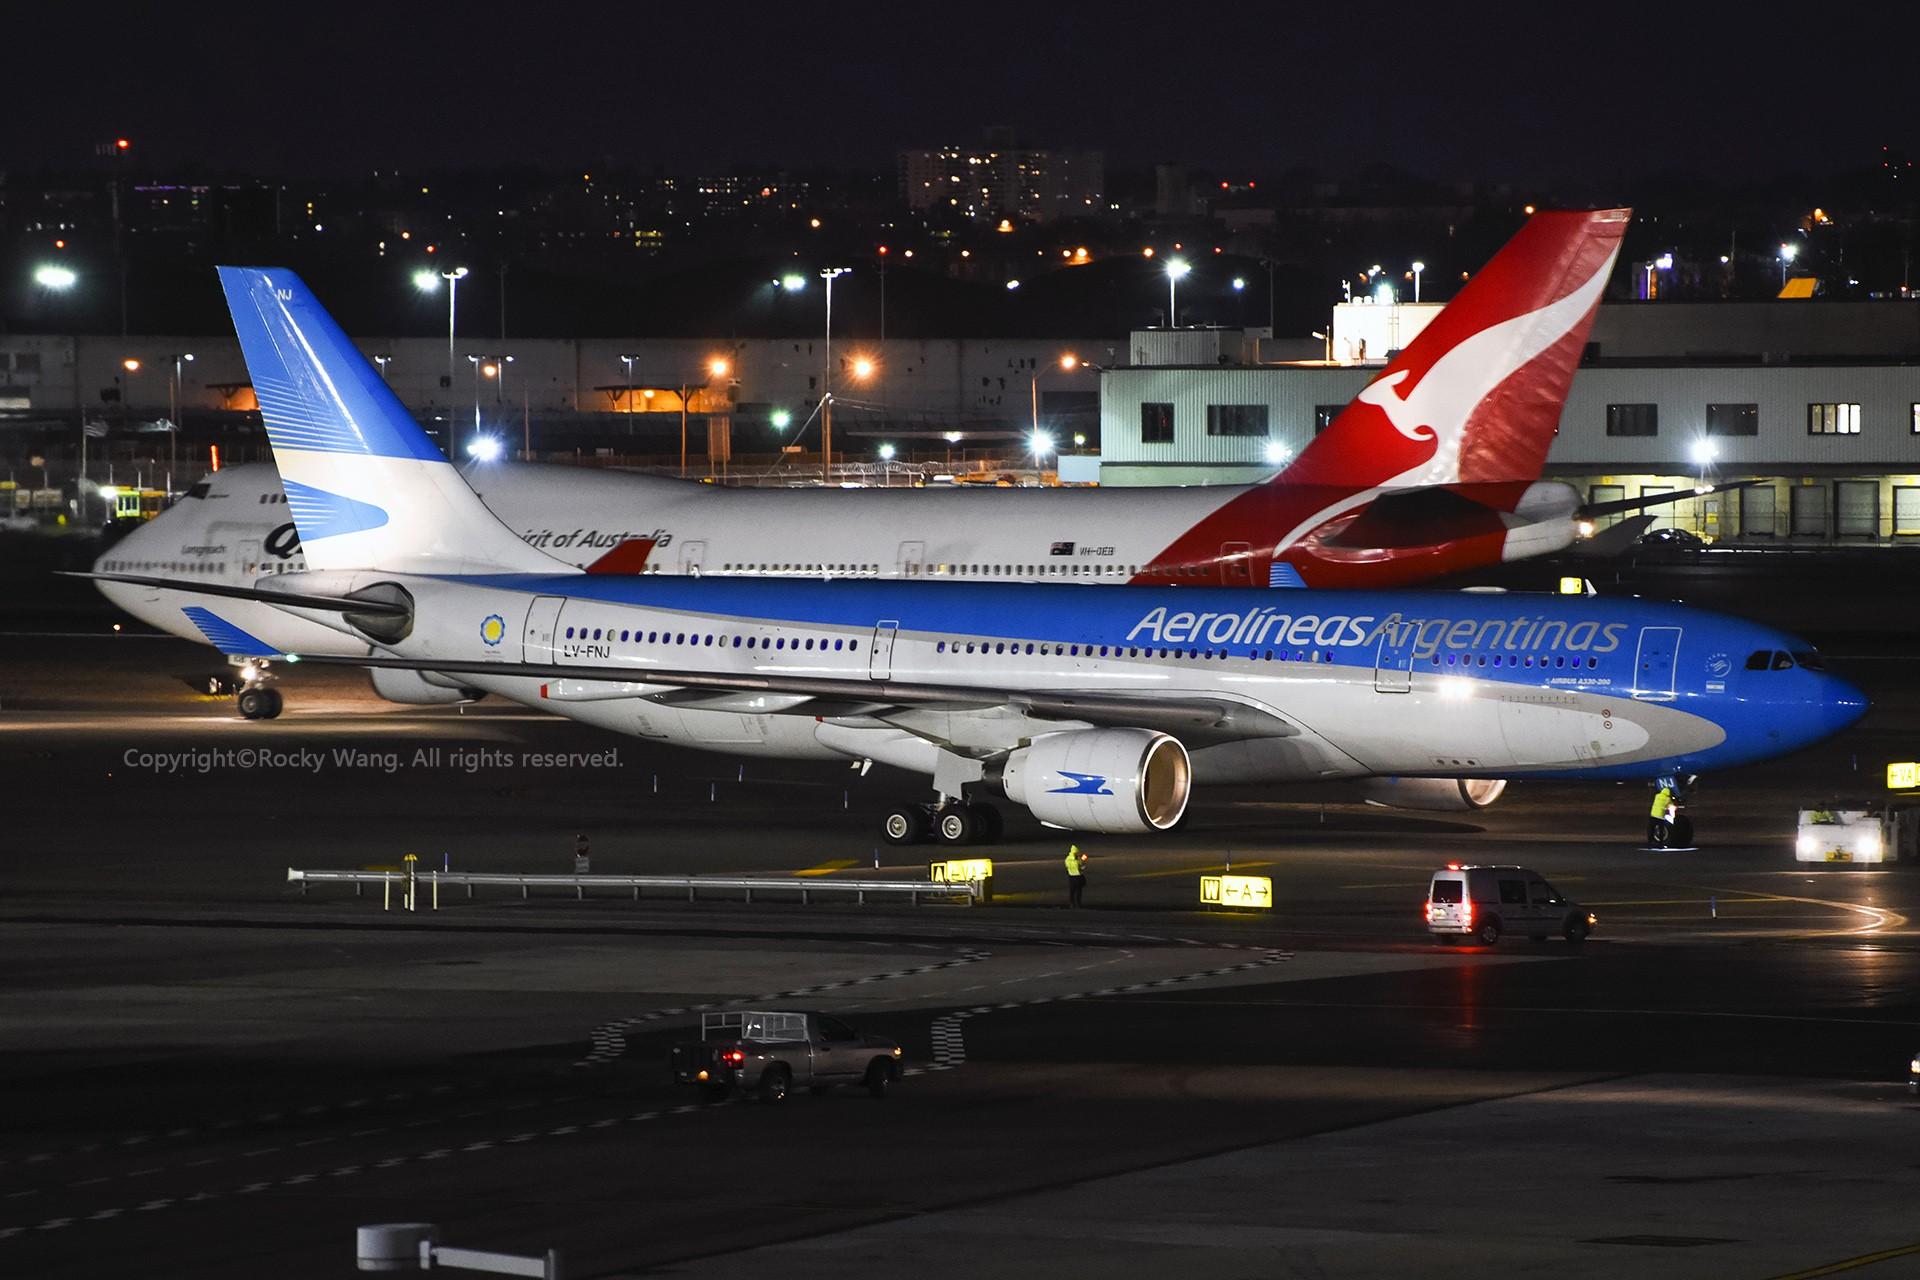 Re:[原创]A330s Around the World AIRBUS A330-223 LV-FNJ 美国纽约约翰·菲茨杰拉德·肯尼迪国际机场